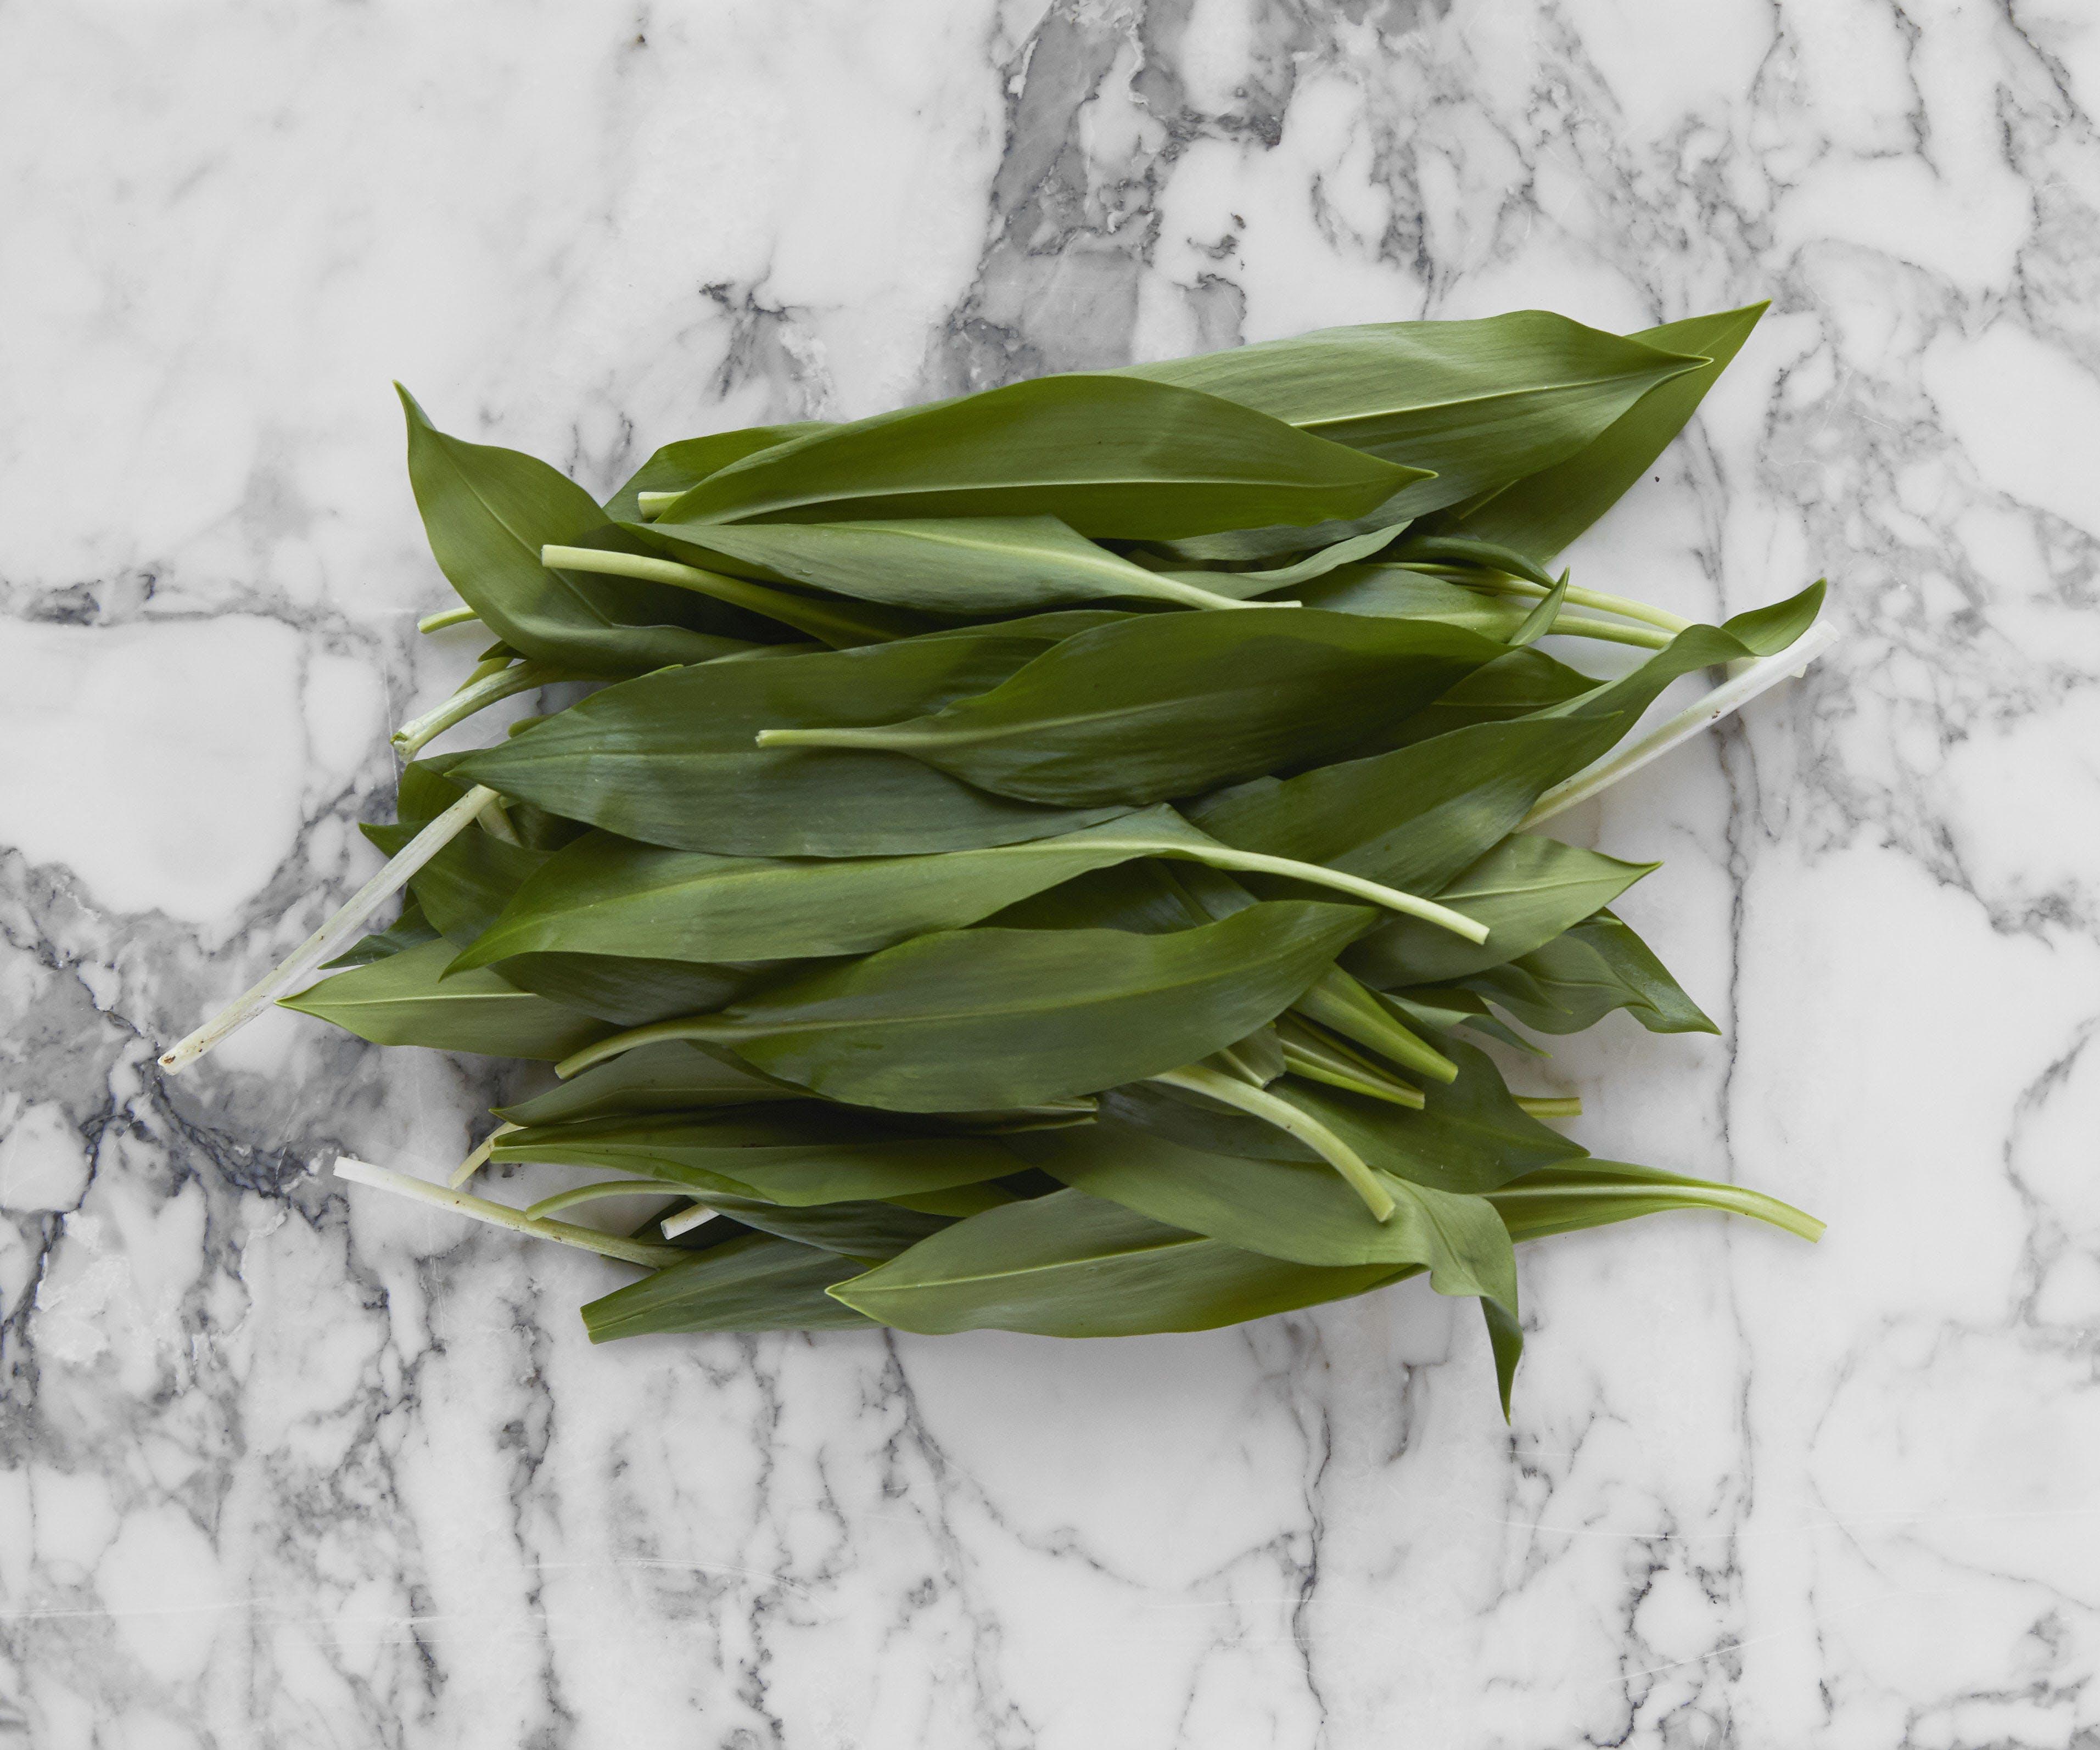 Wild Garlic (Ramsons)